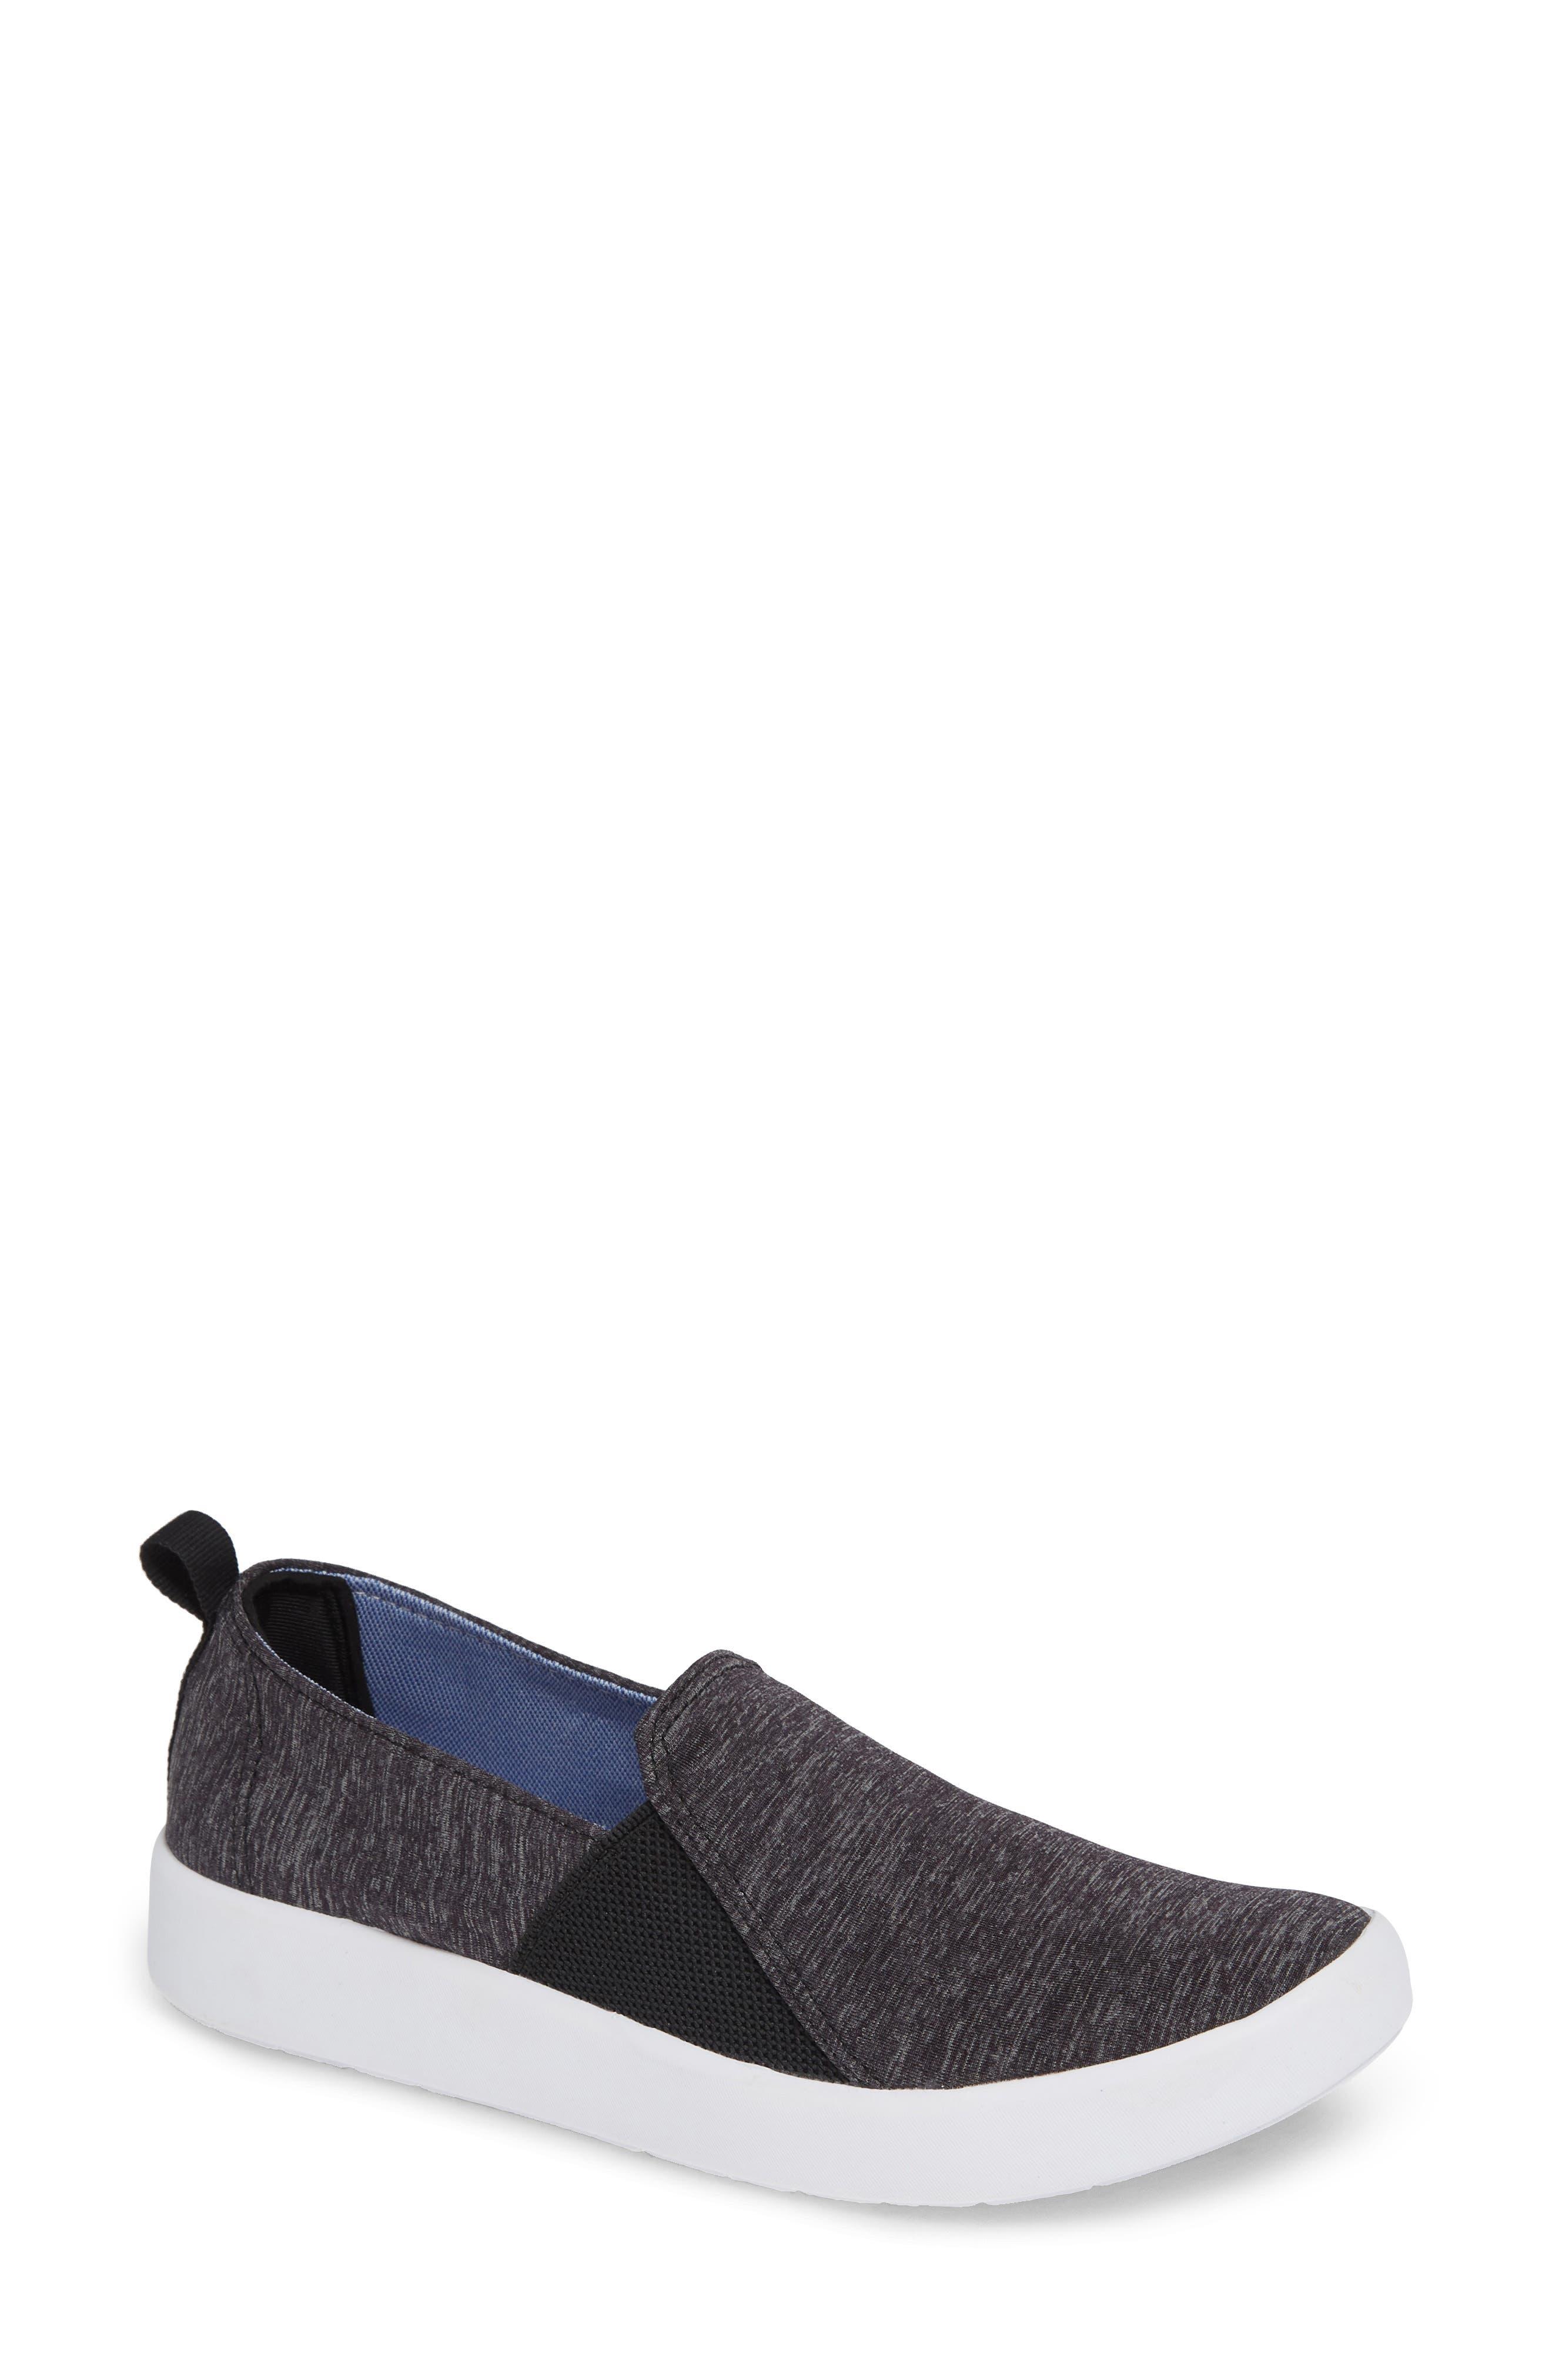 KEDS<SUP>®</SUP>, Studio Liv Active Knit Sneaker, Main thumbnail 1, color, BLACK